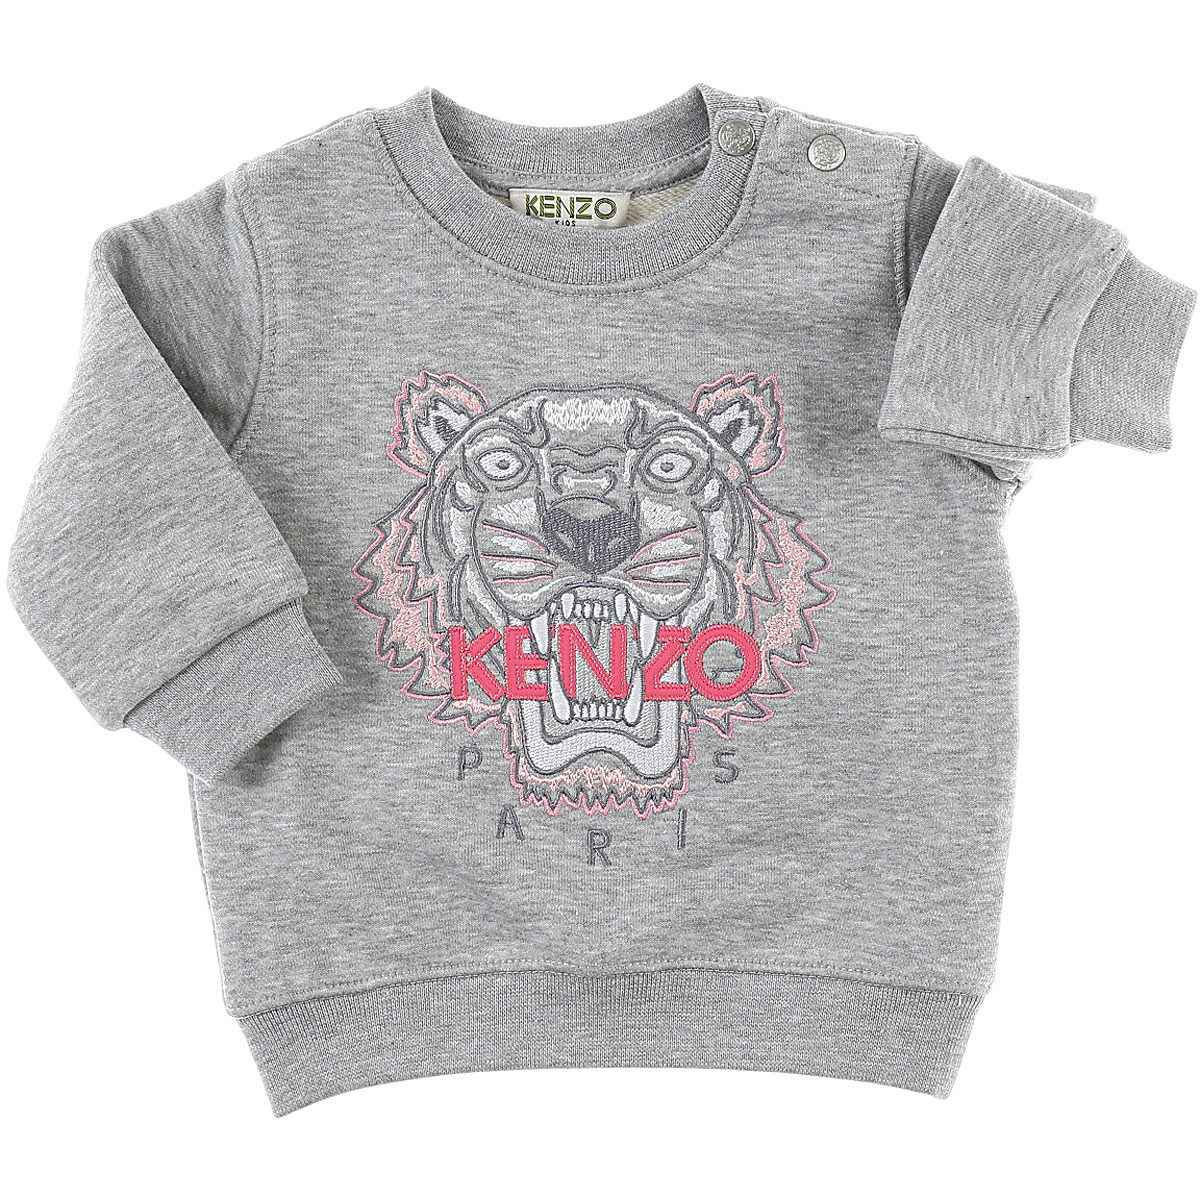 Image of Kenzo Baby Sweatshirts & Hoodies for Girls, Grey, Cotton, 2017, 10Y 12M 14Y 16Y 18M 2Y 3Y 4Y 6M 6Y